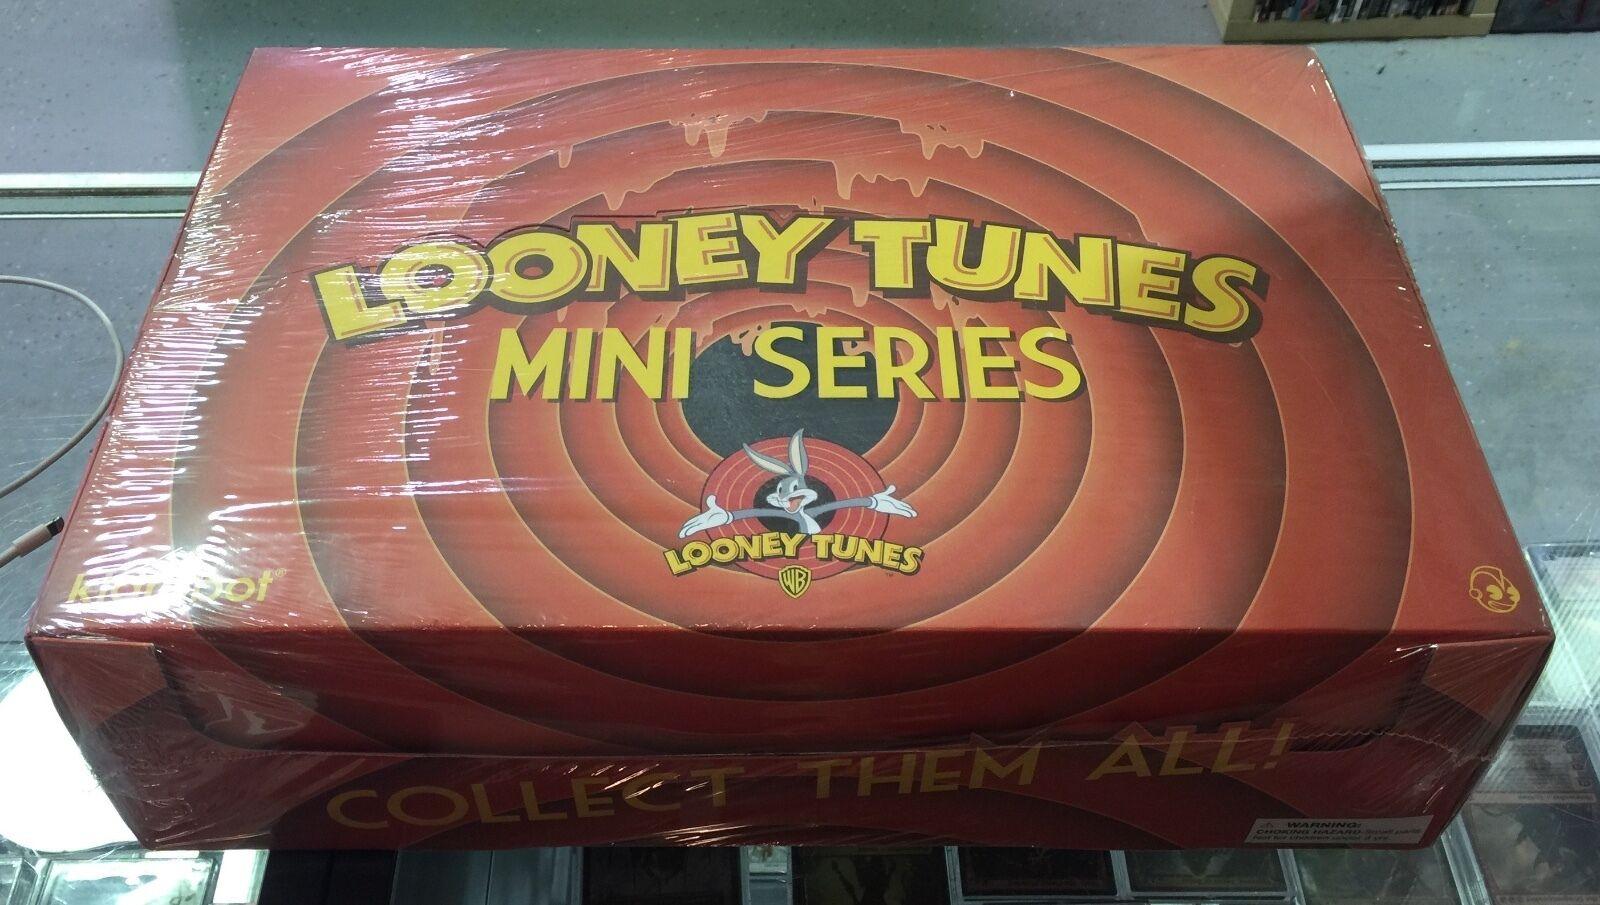 KIDROBOT Looney Tunes blind box display of 20 3  figures NEW SEALED CASE